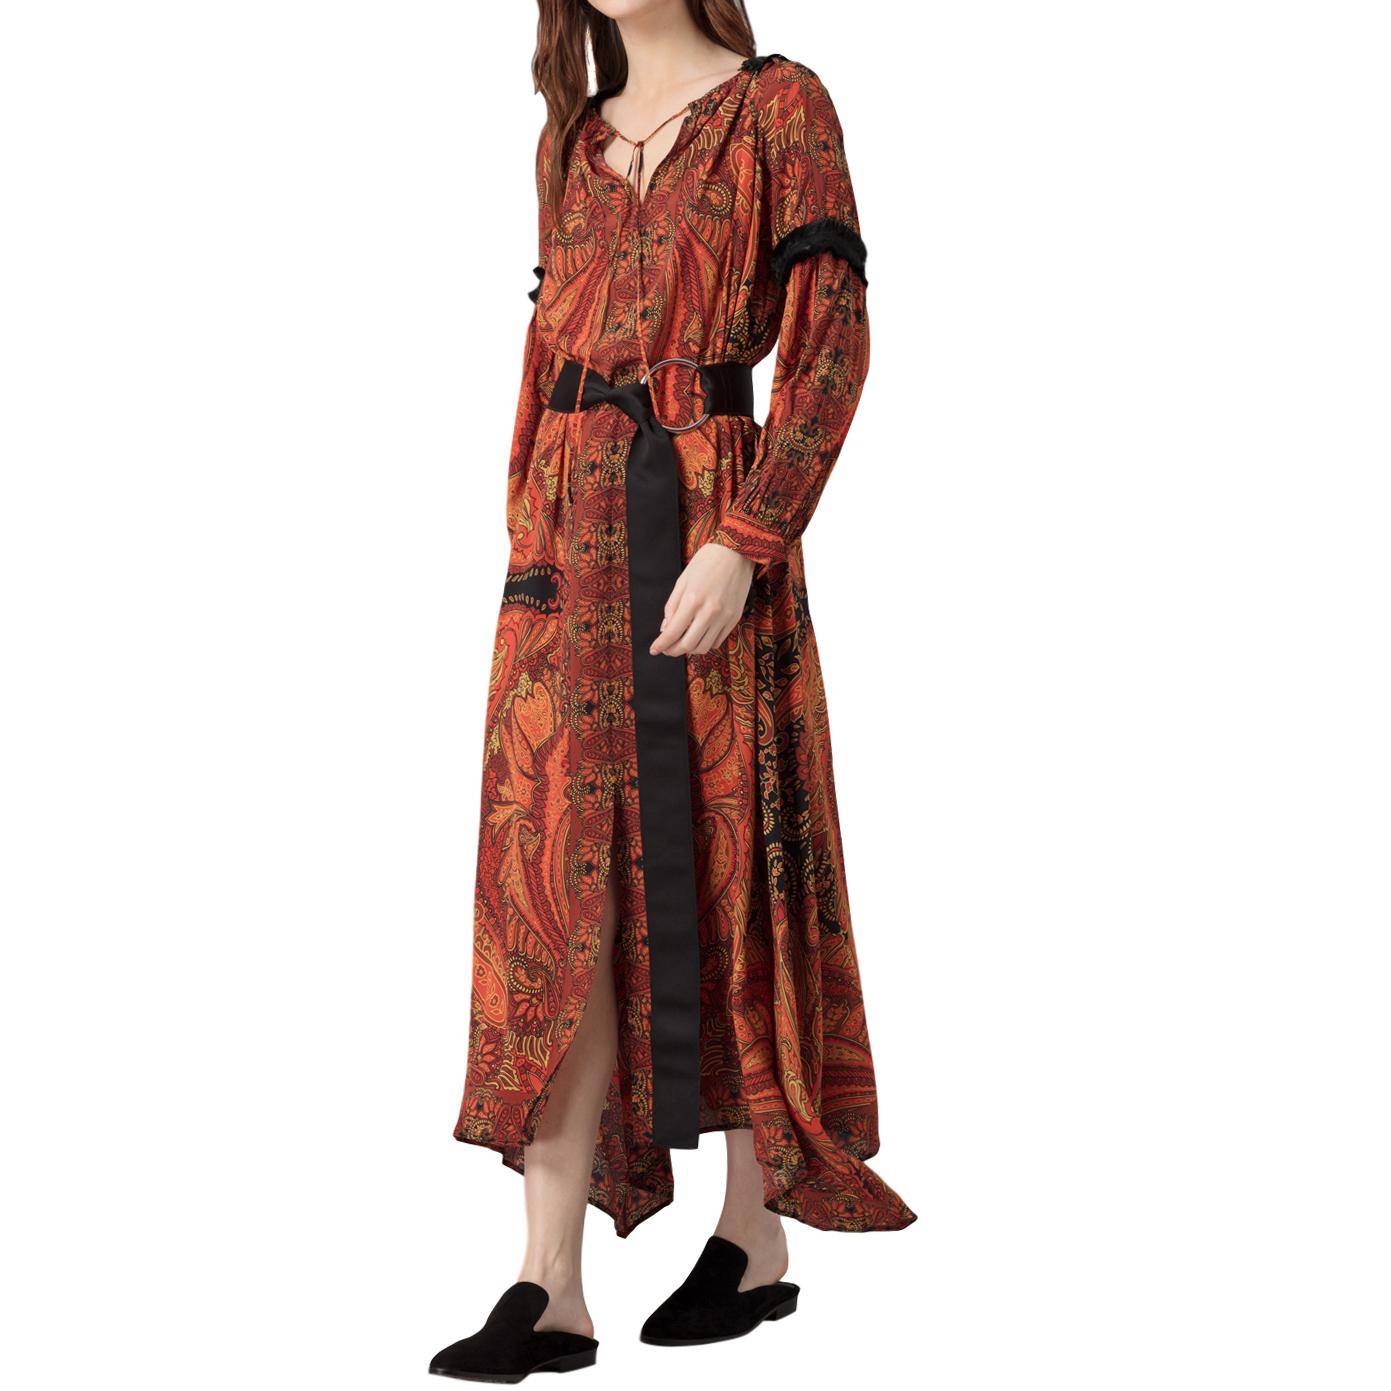 Amanda Wakeley Printed Crepe de Chine Midi Dress - New Season